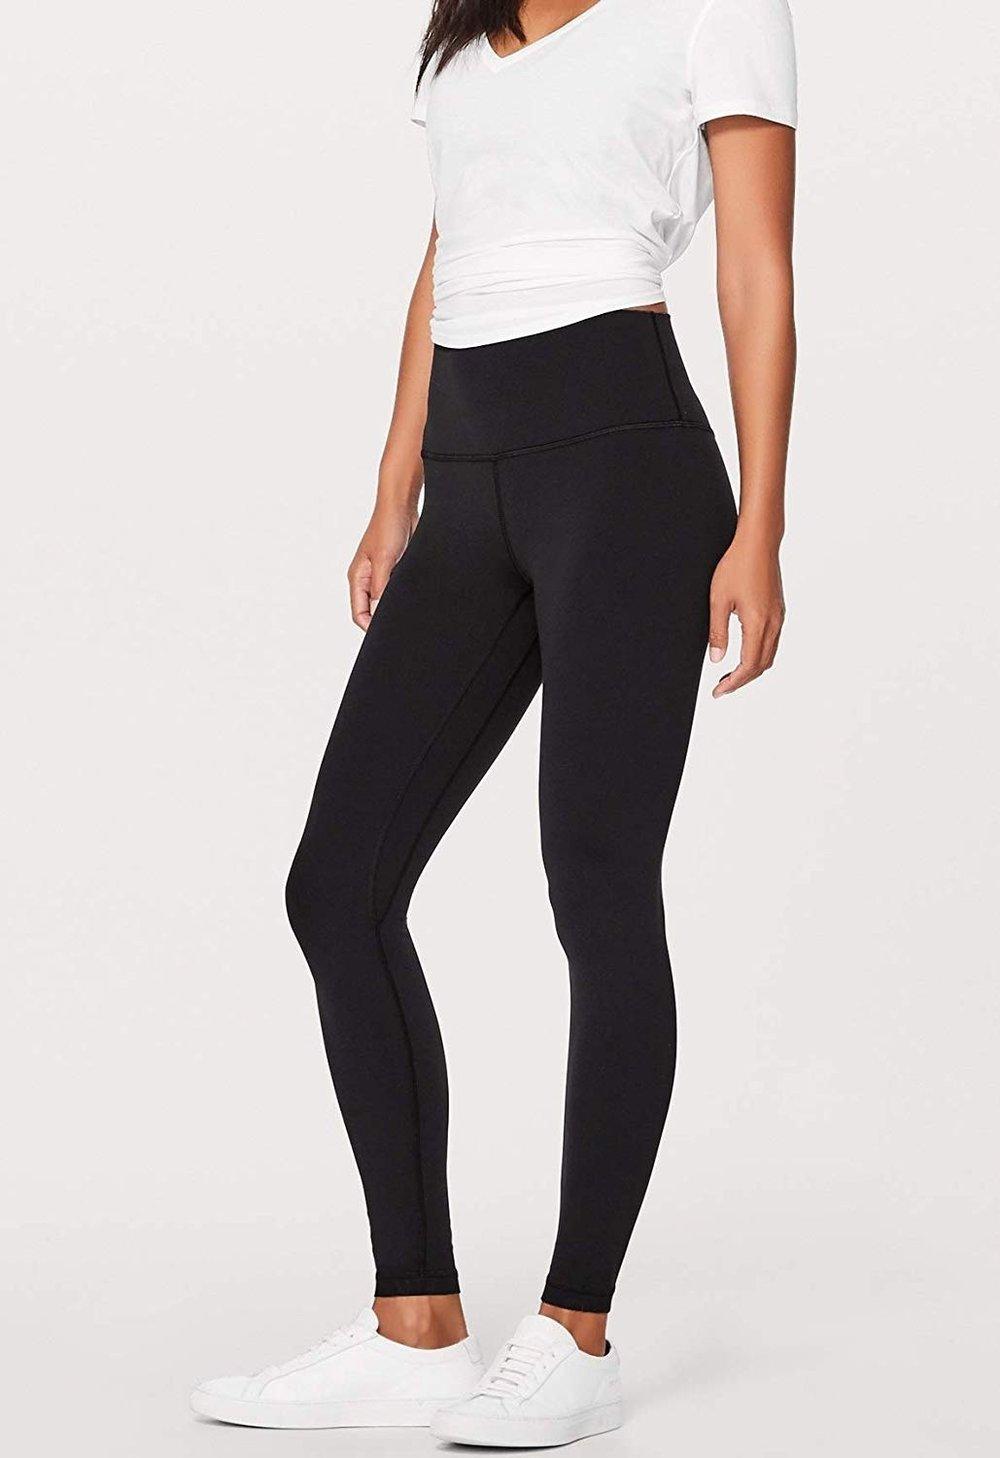 Lululemon Align Yoga Pants